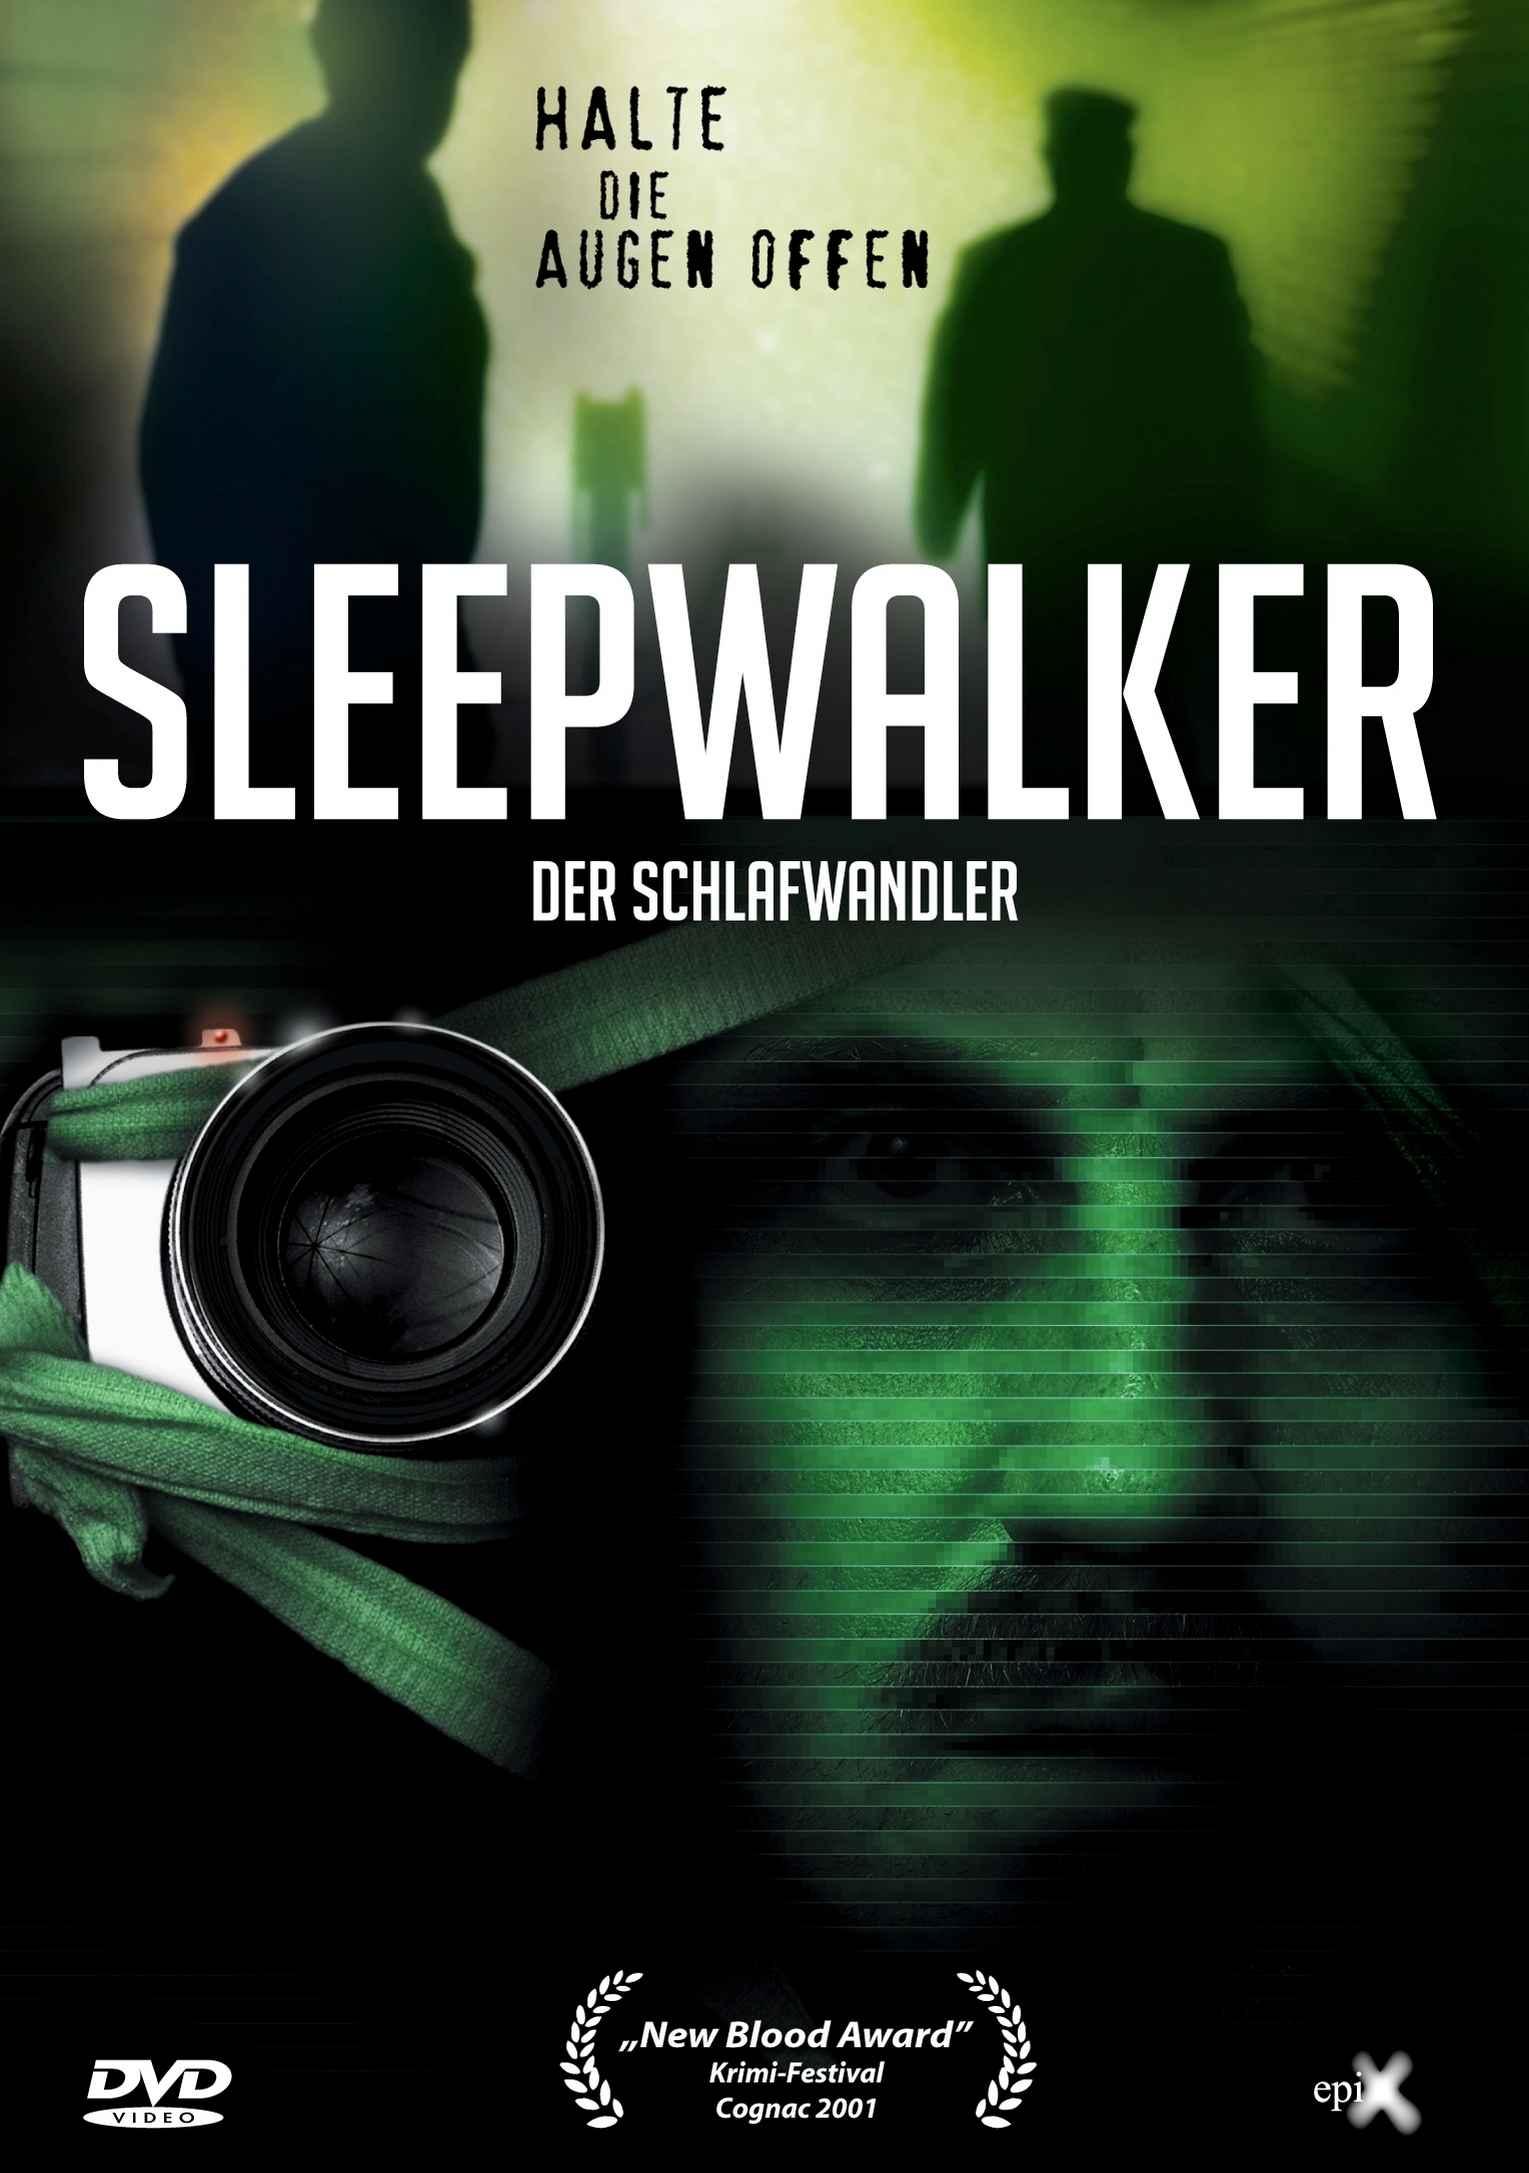 SLEEPWALKER Front FINAL